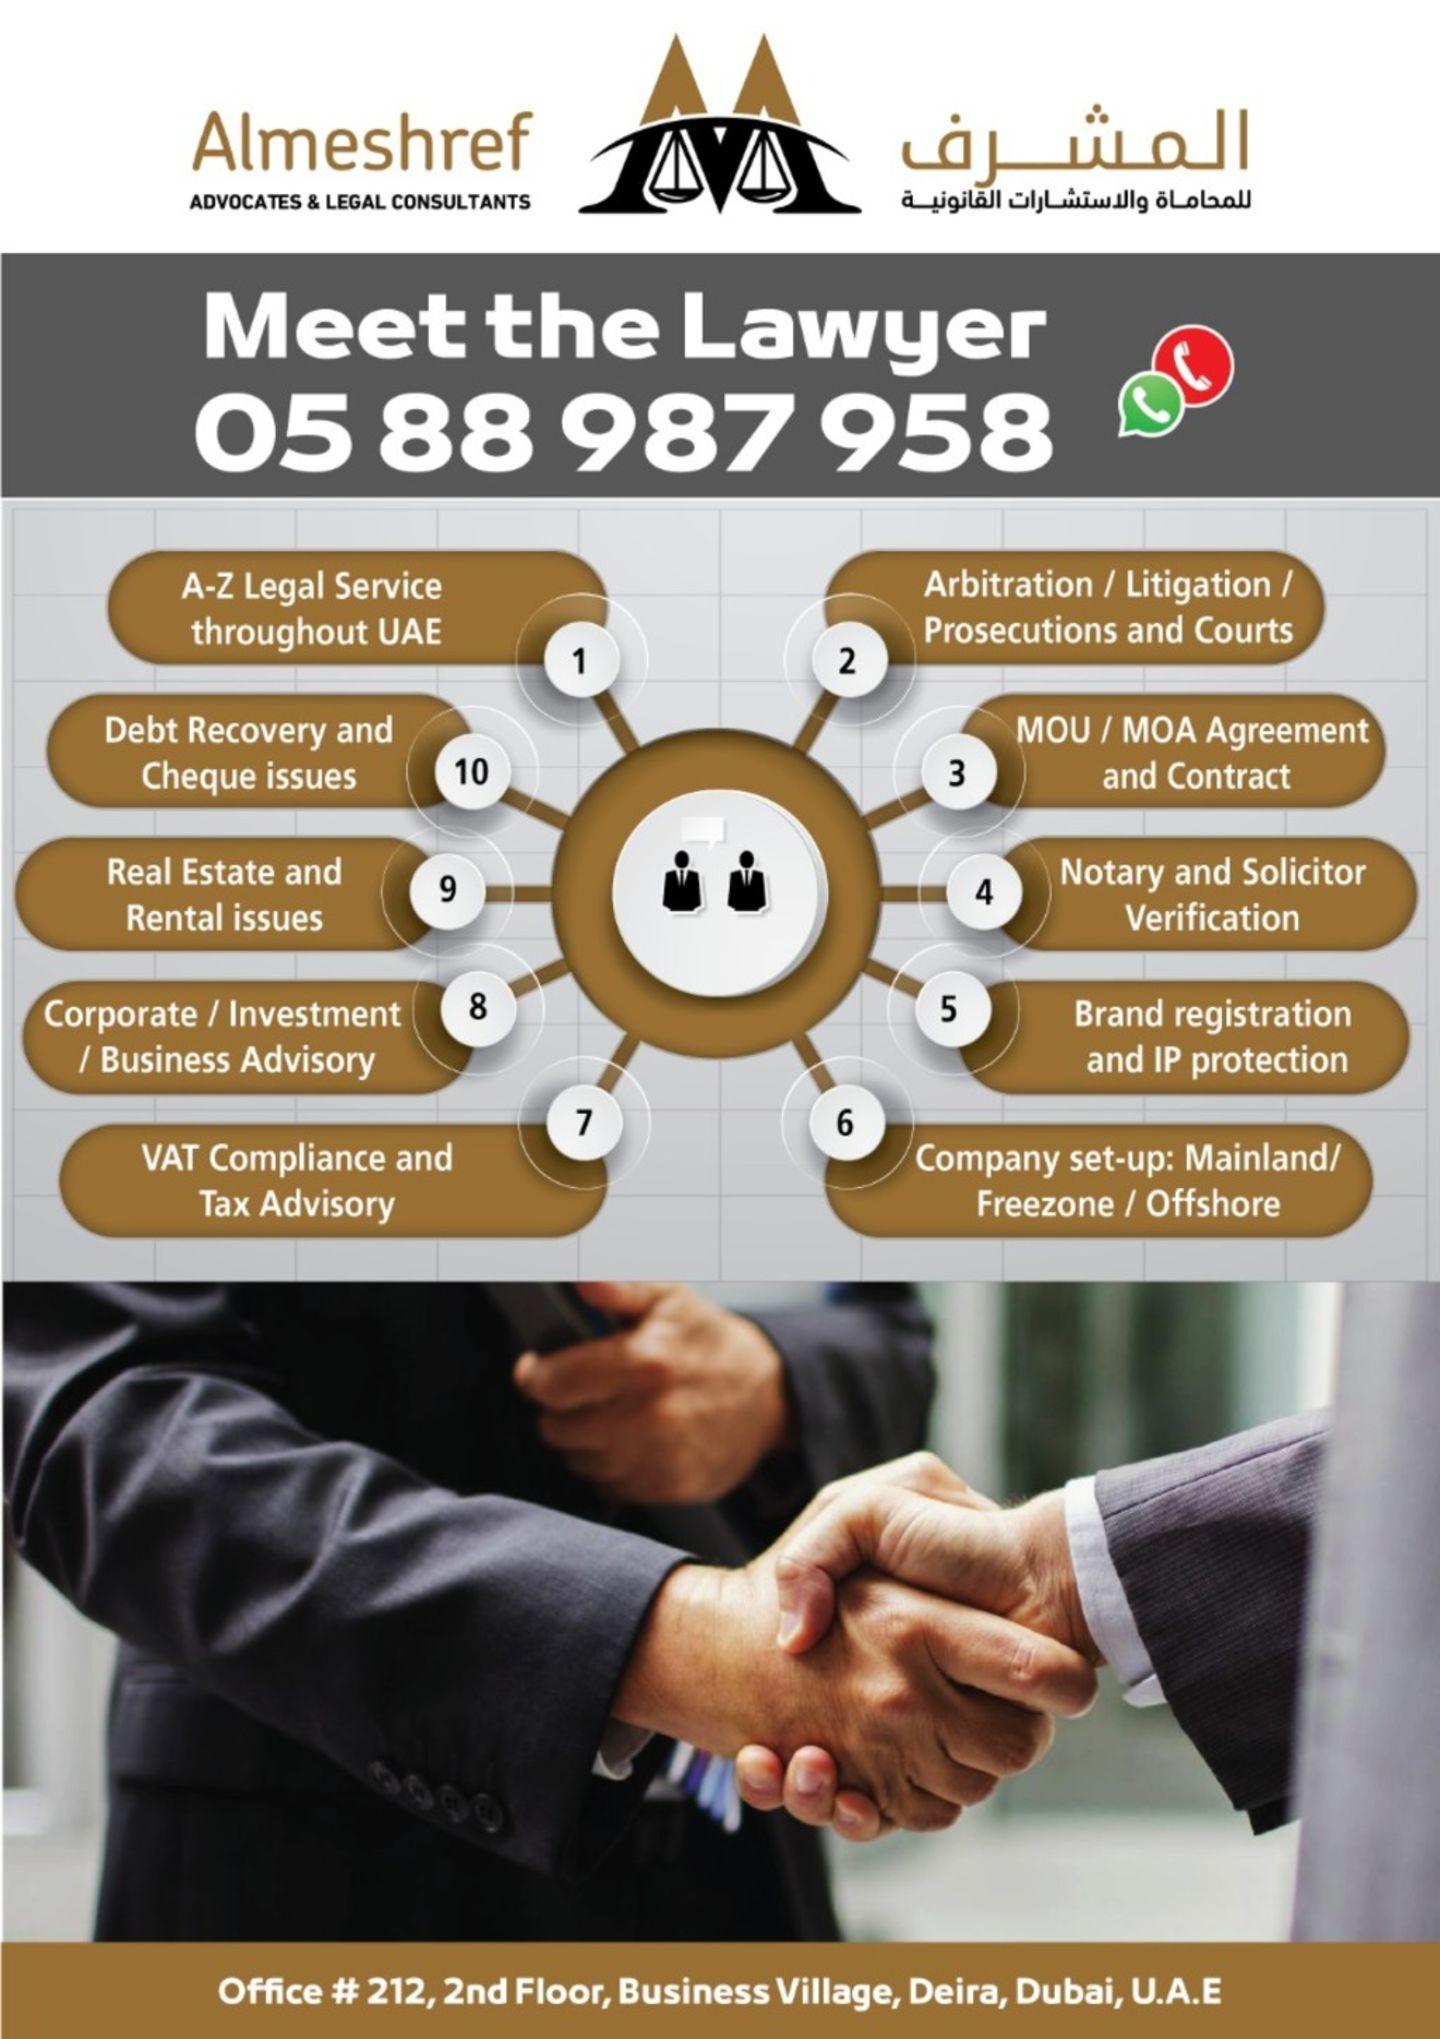 HiDubai-business-al-meshref-advocates-and-legal-consultants-finance-legal-legal-services-port-saeed-dubai